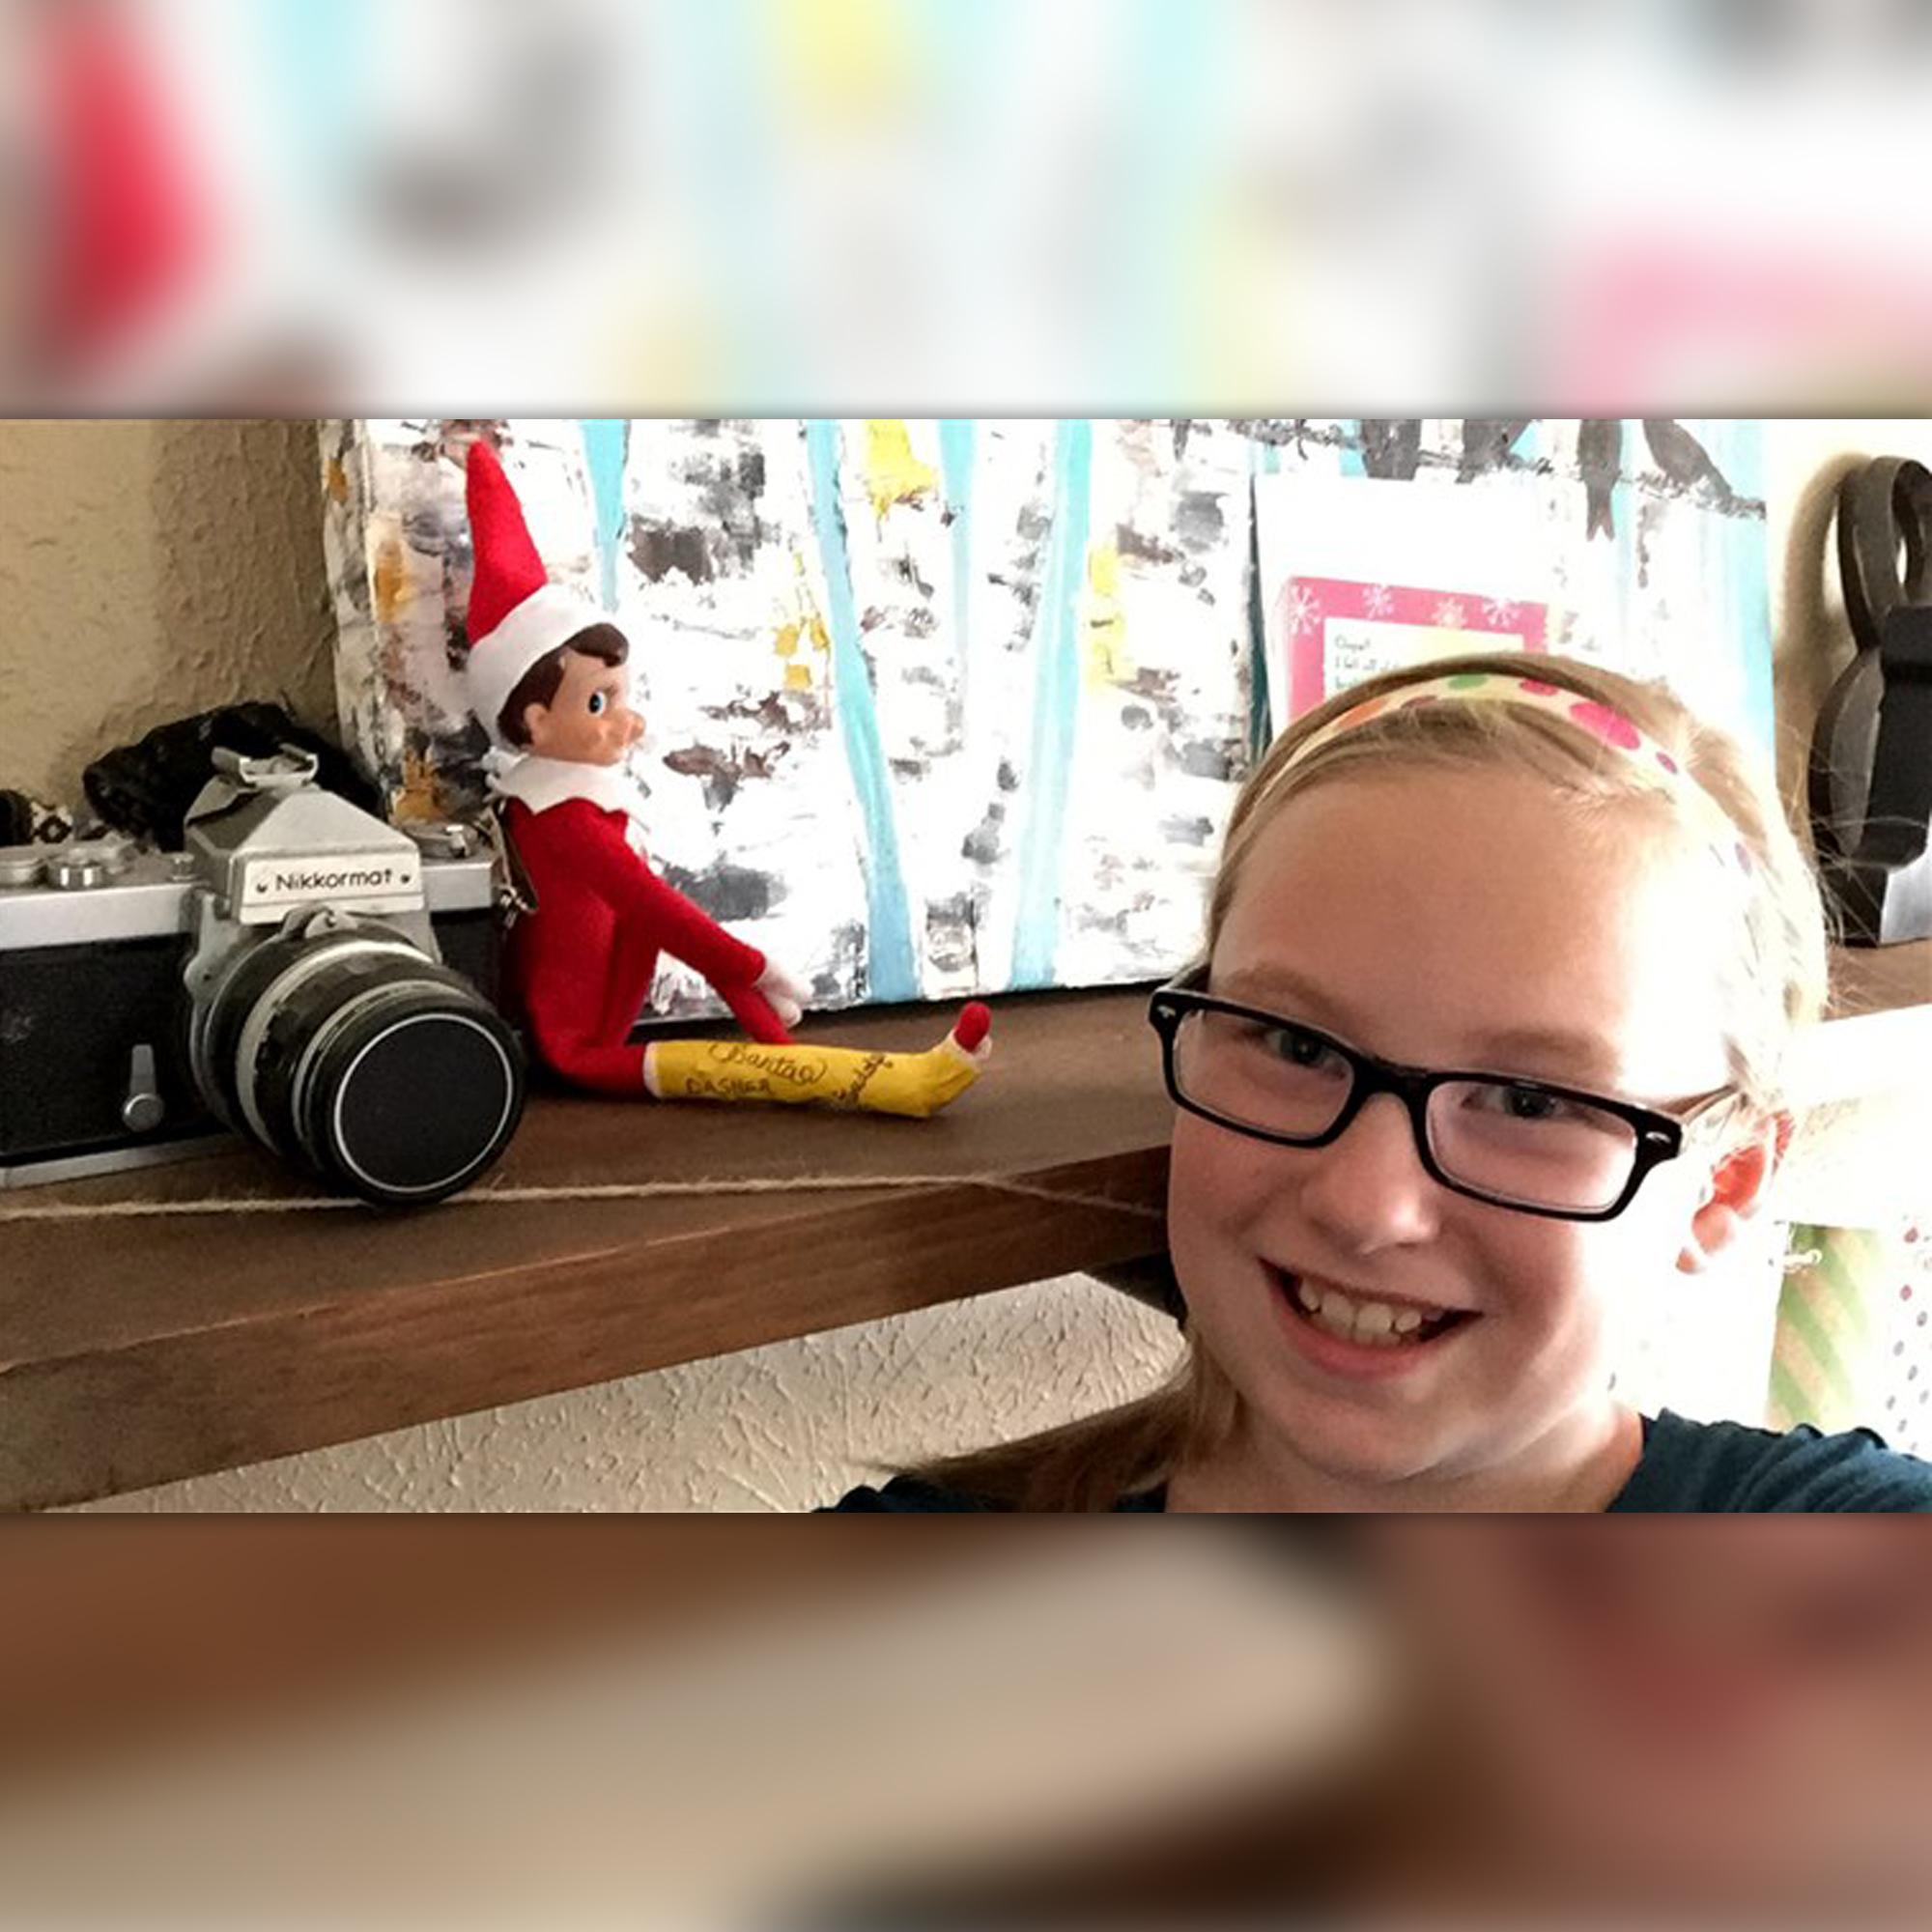 Elf On The Shelf With A Broken Leg Helps Mom Win Christmas